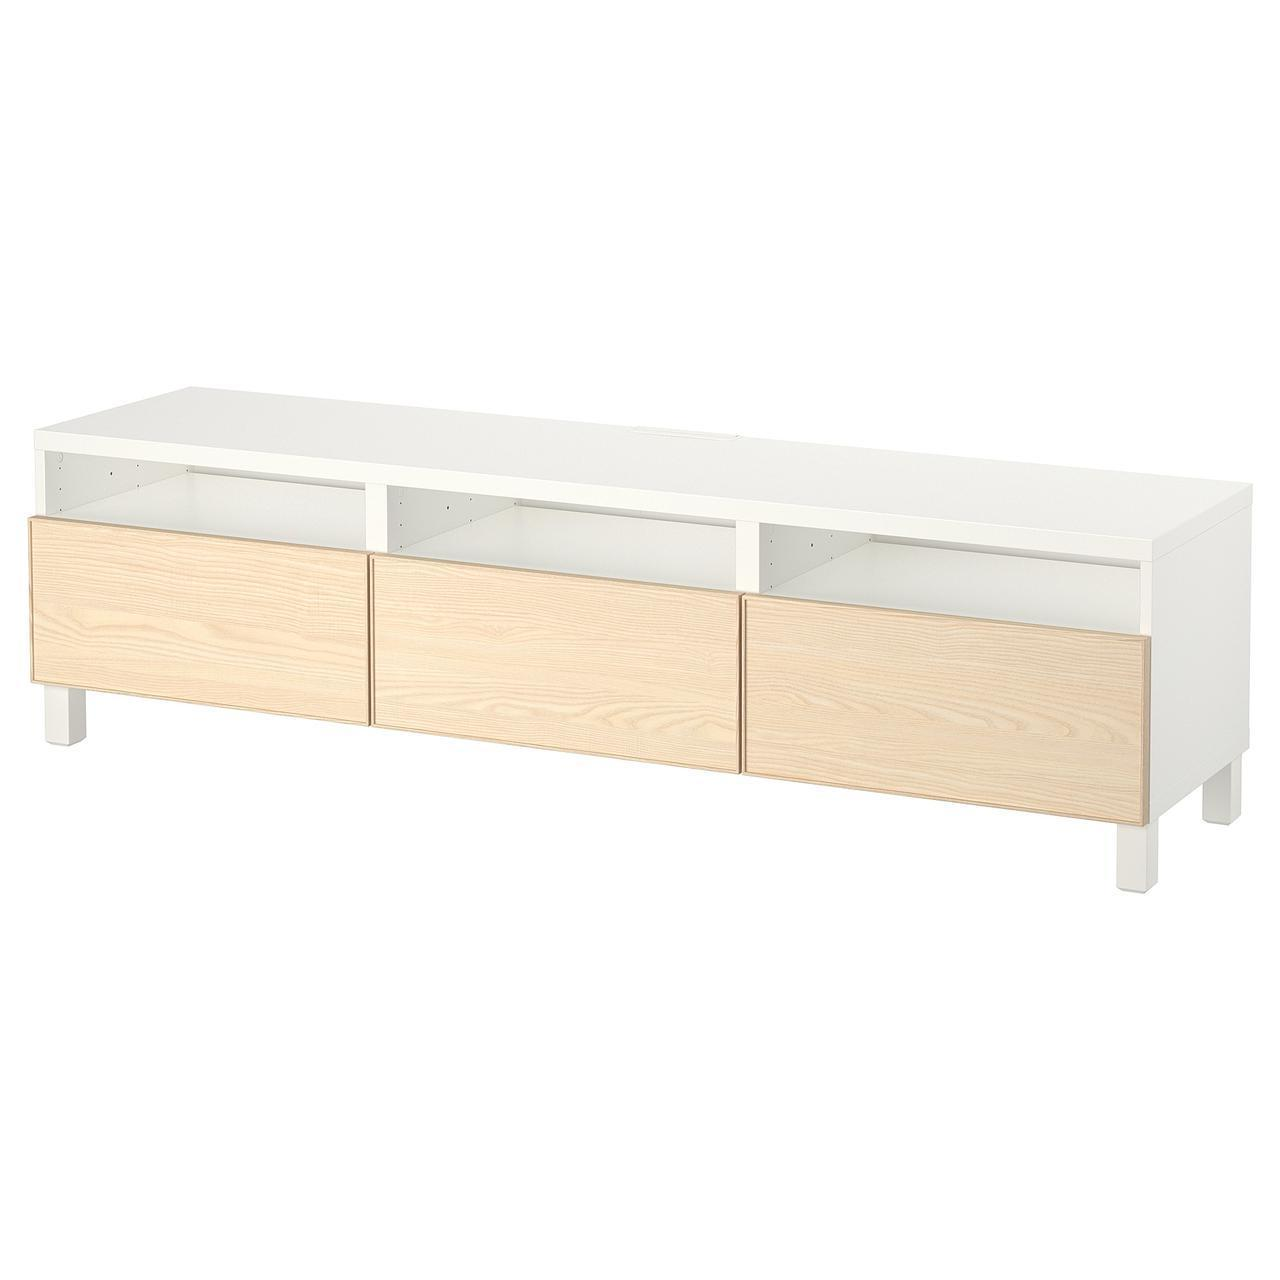 IKEA BESTA Тумба під телевізор з ящиками, білий, Инвикен шпон (492.057.50)